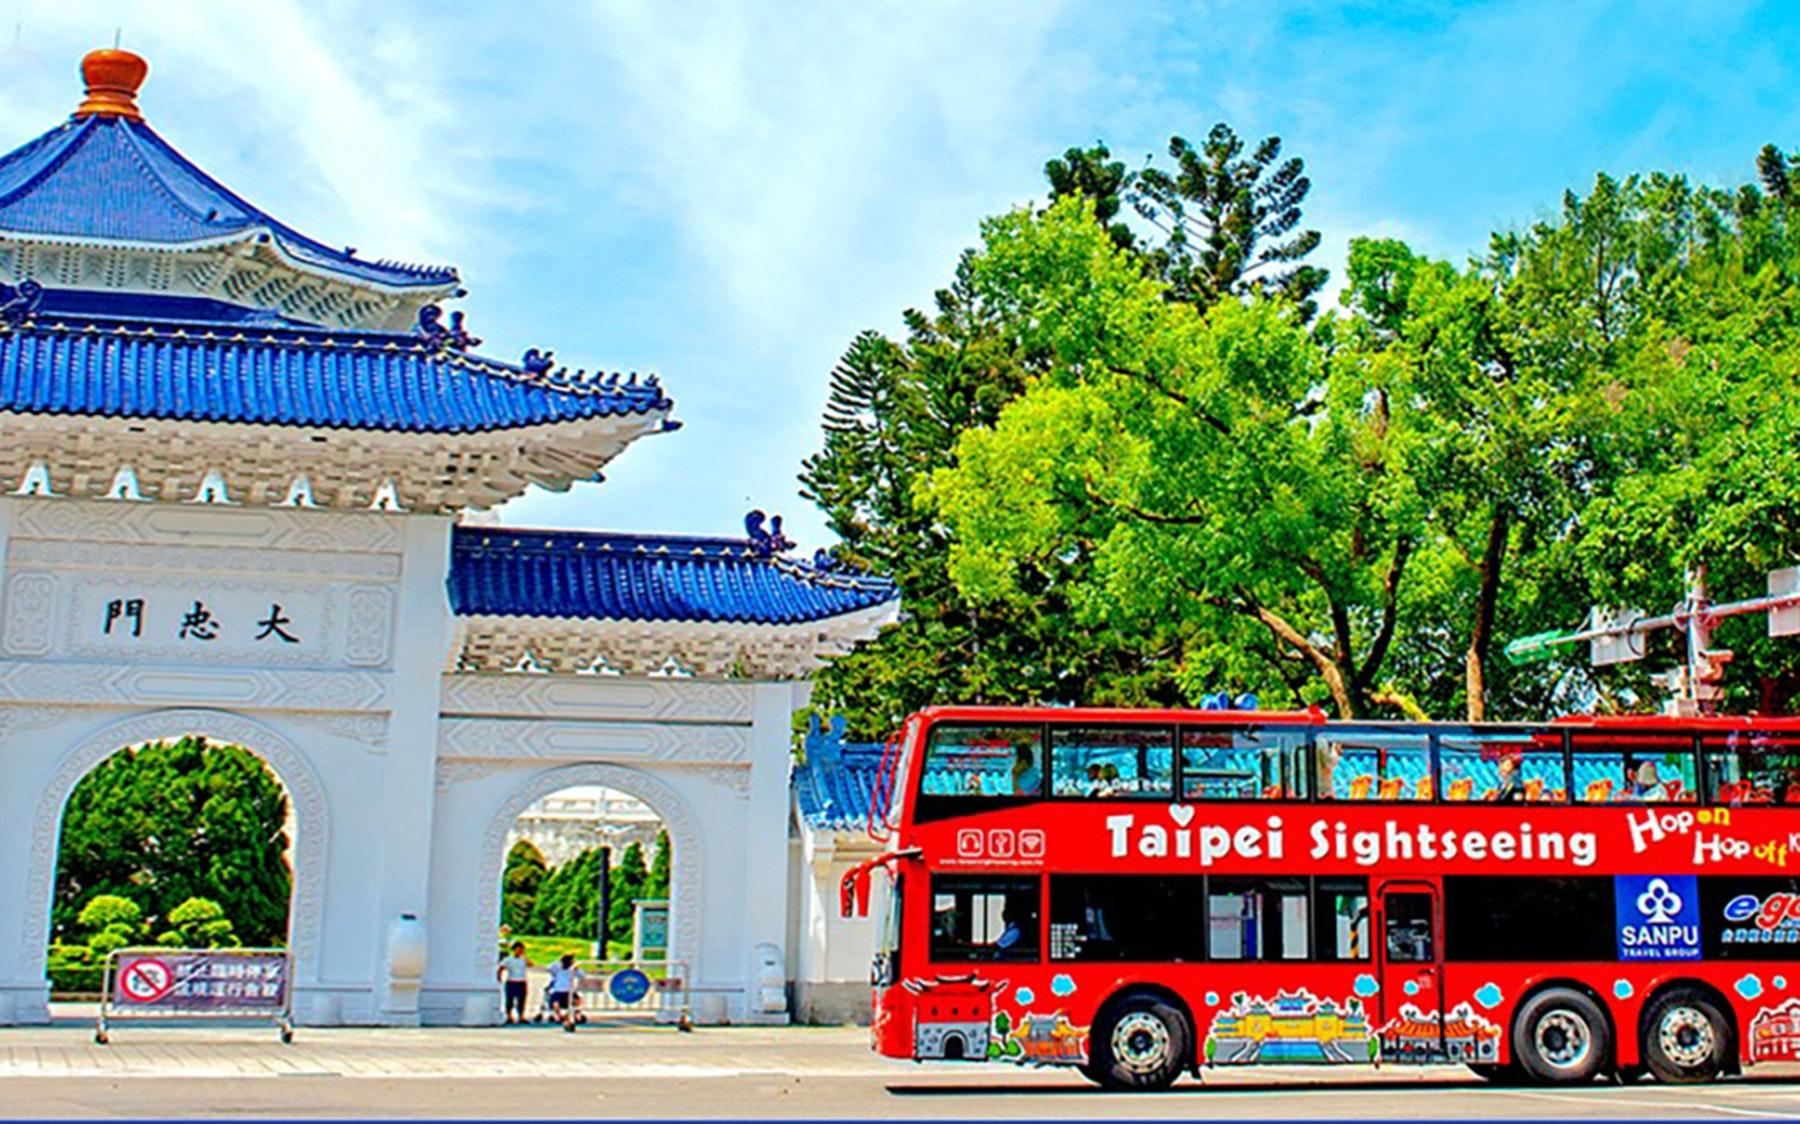 Taipei Hop on Hop off